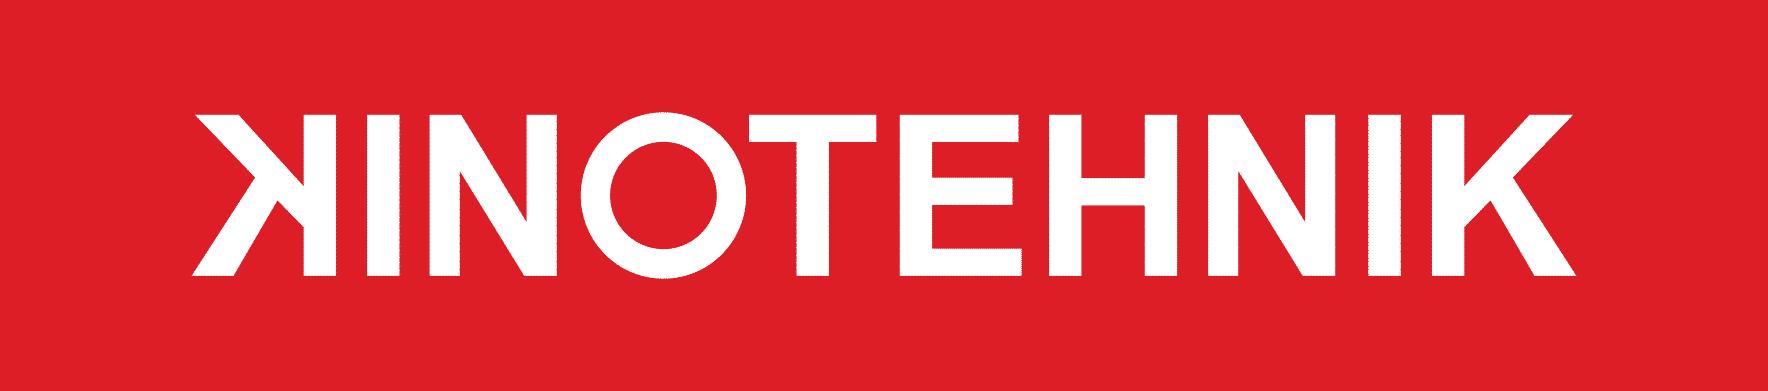 Kinotehnik Logo